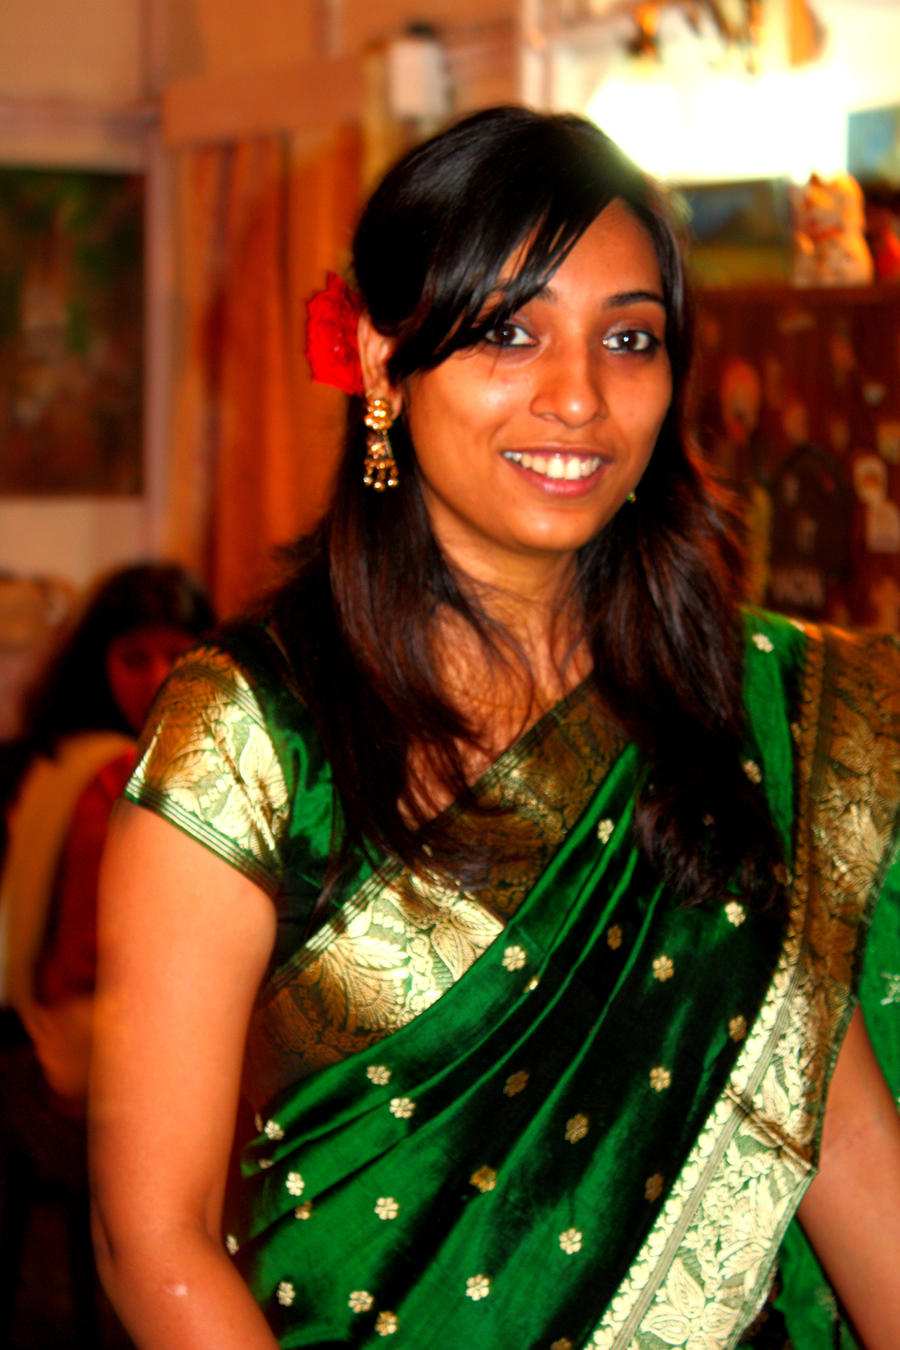 Beautifull and latest mehndi design dresses design for gilrs 2012 - 20 Absolute Mehndi Design Wallpaper Cool Hd